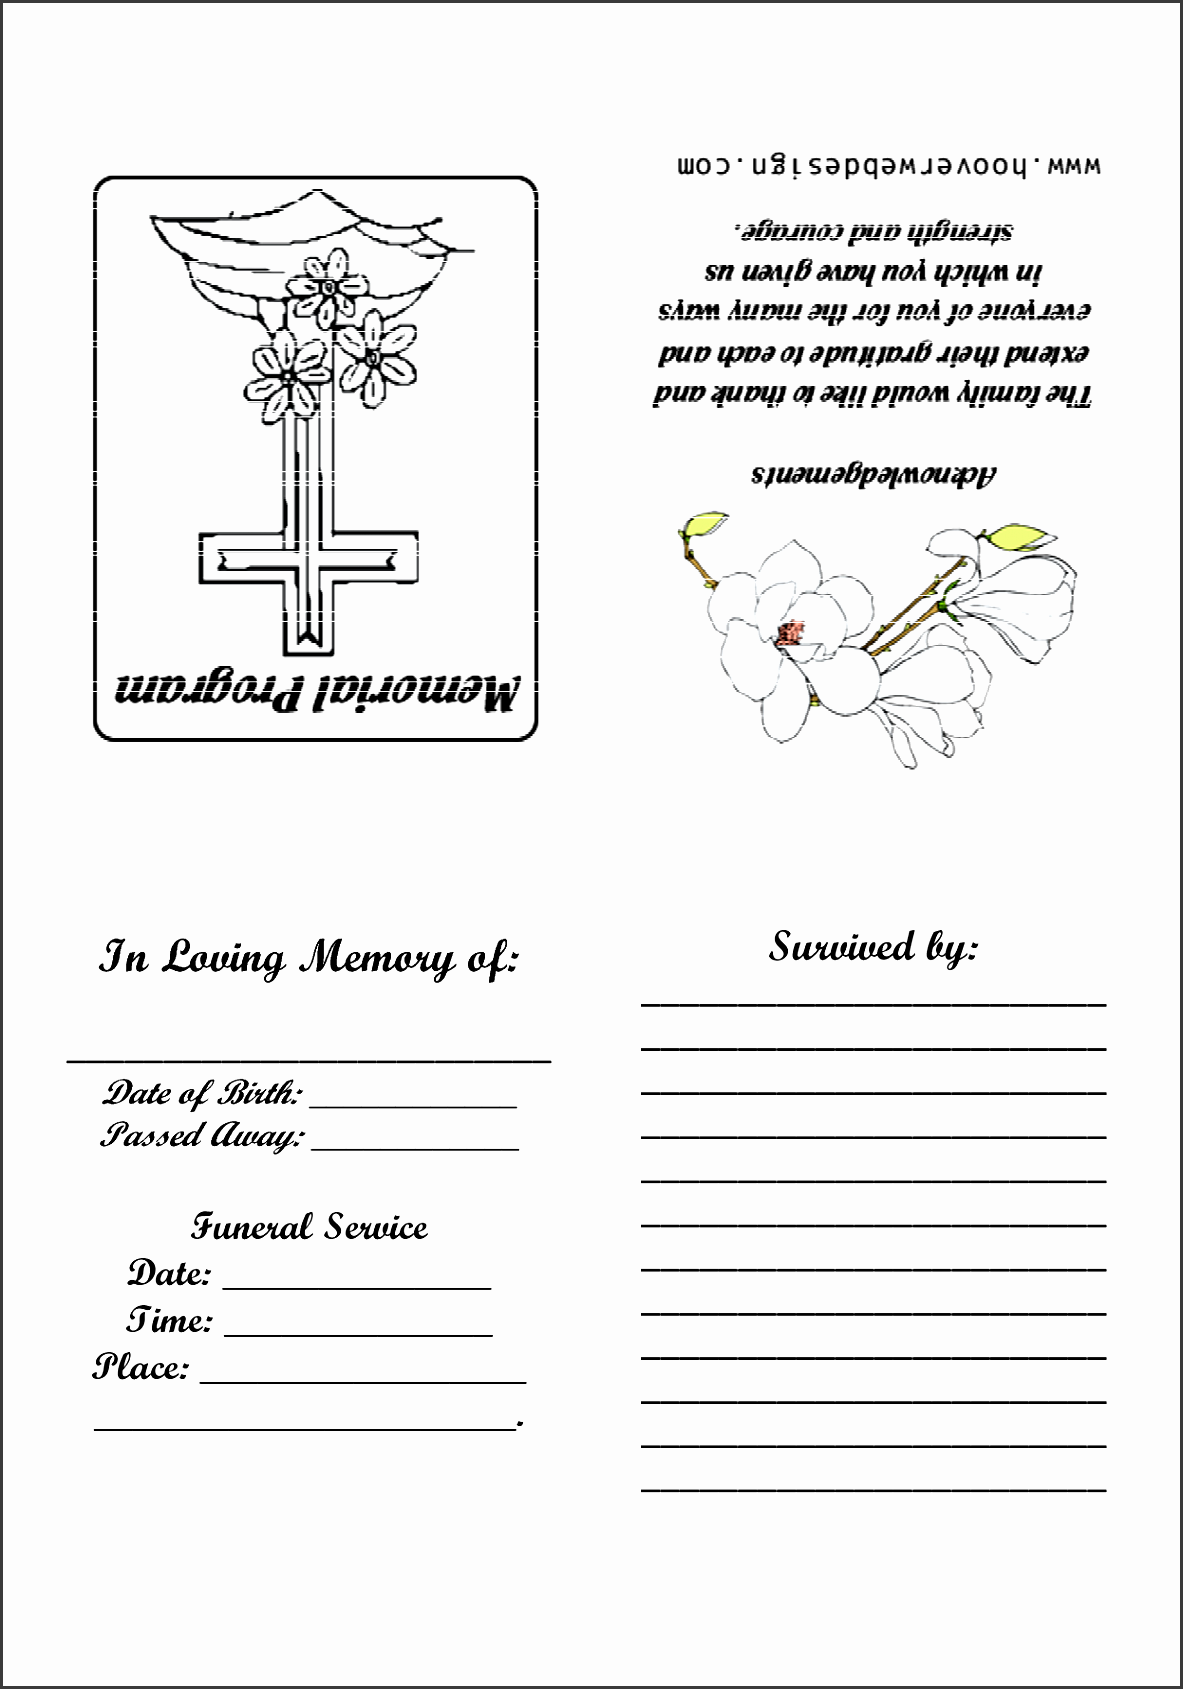 printable funeral memorial program pdf by wmj